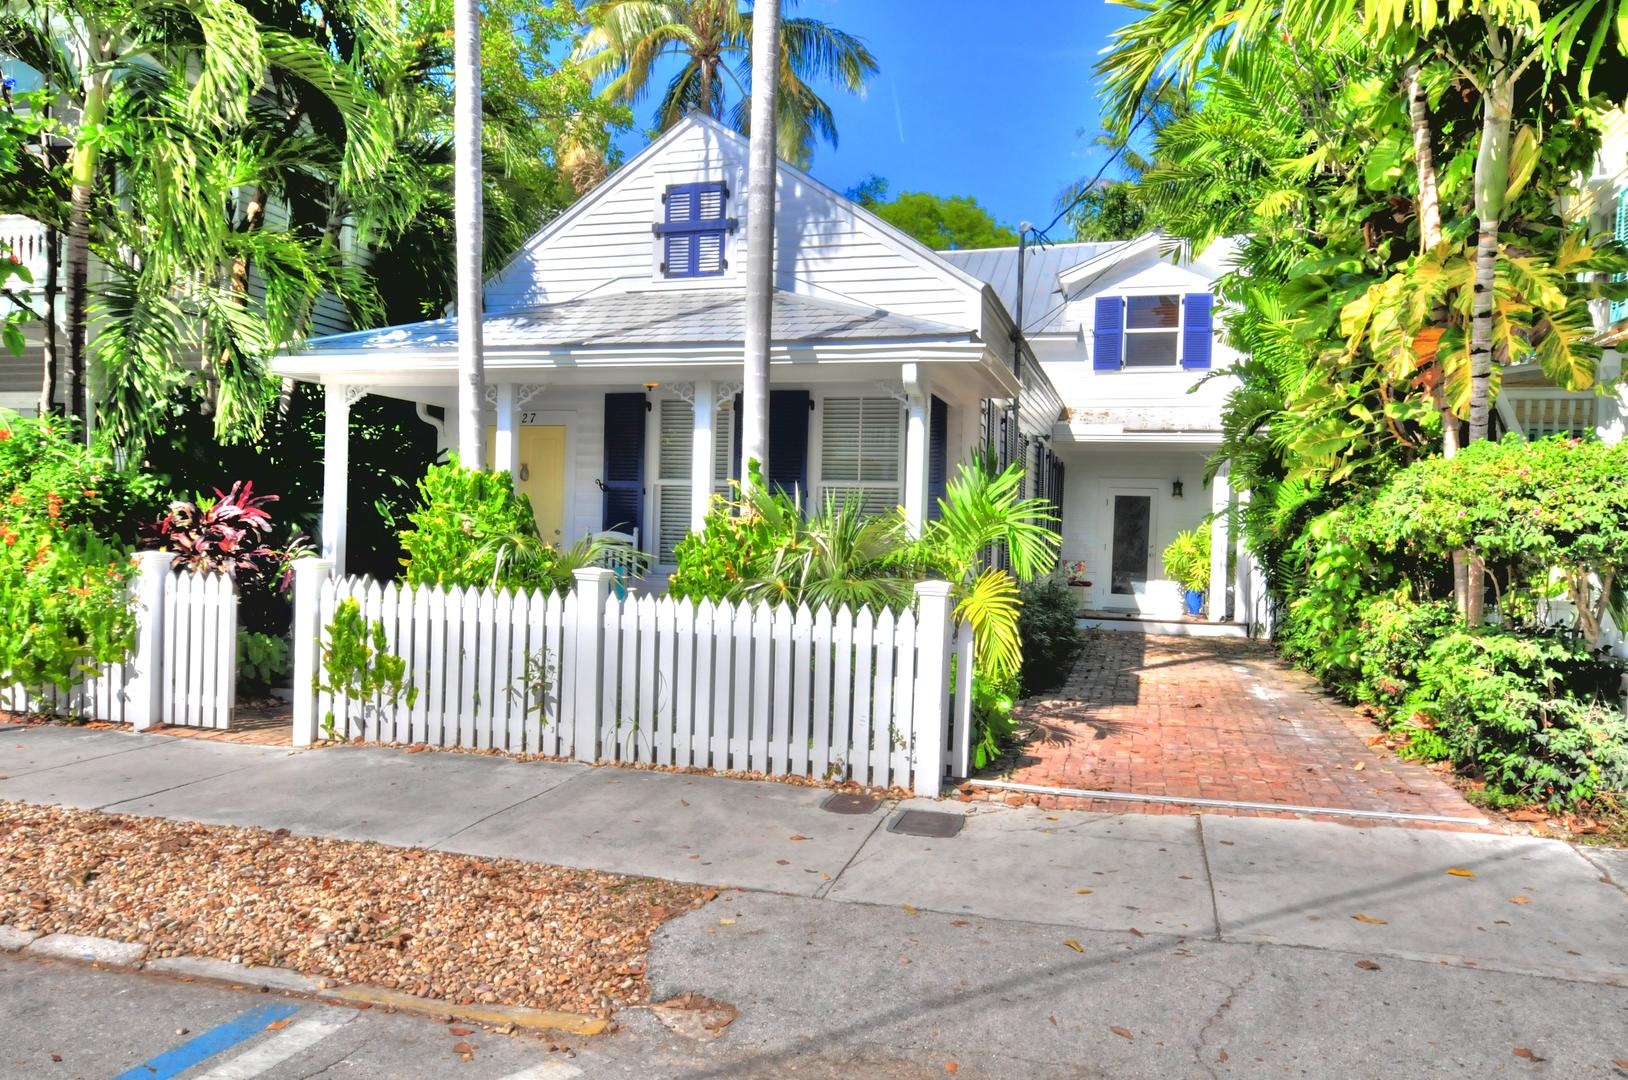 The William Street Manor-